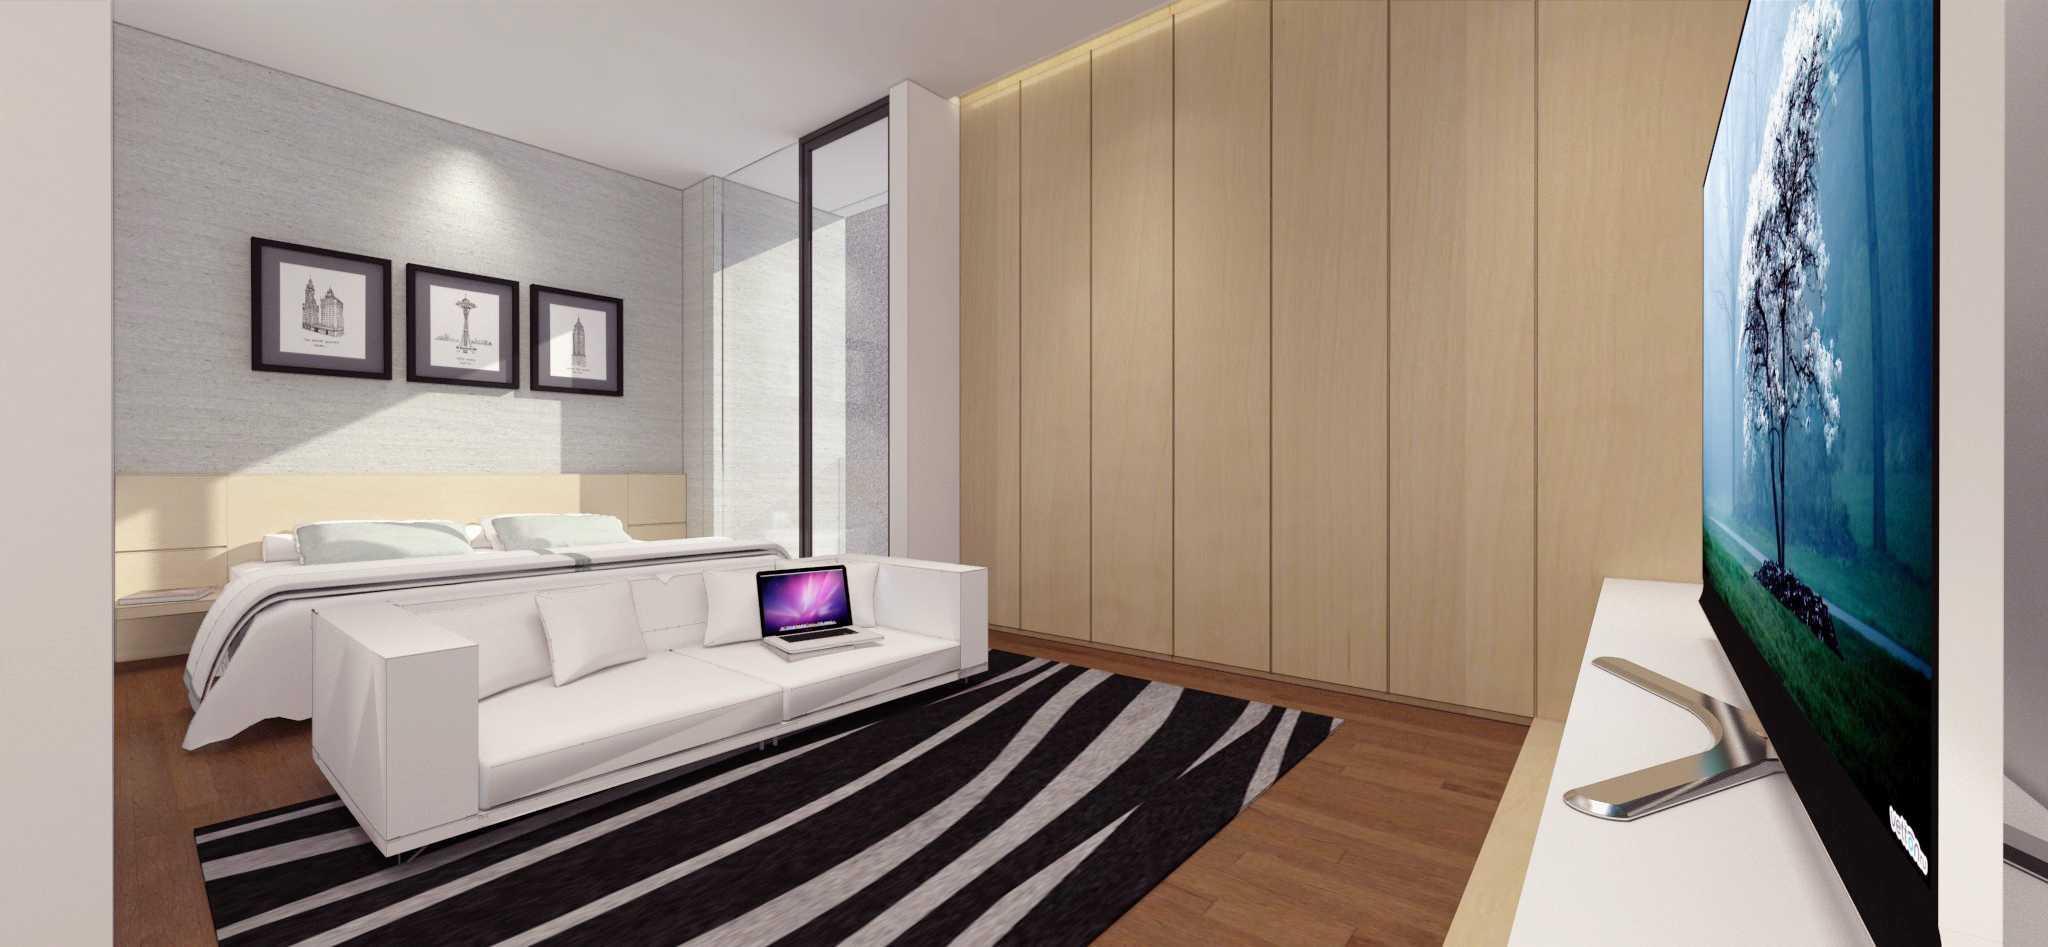 Ari Wibowo Design (Aw.d) Rk House Jakarta, Indonesia - Bedroom Modern  14521